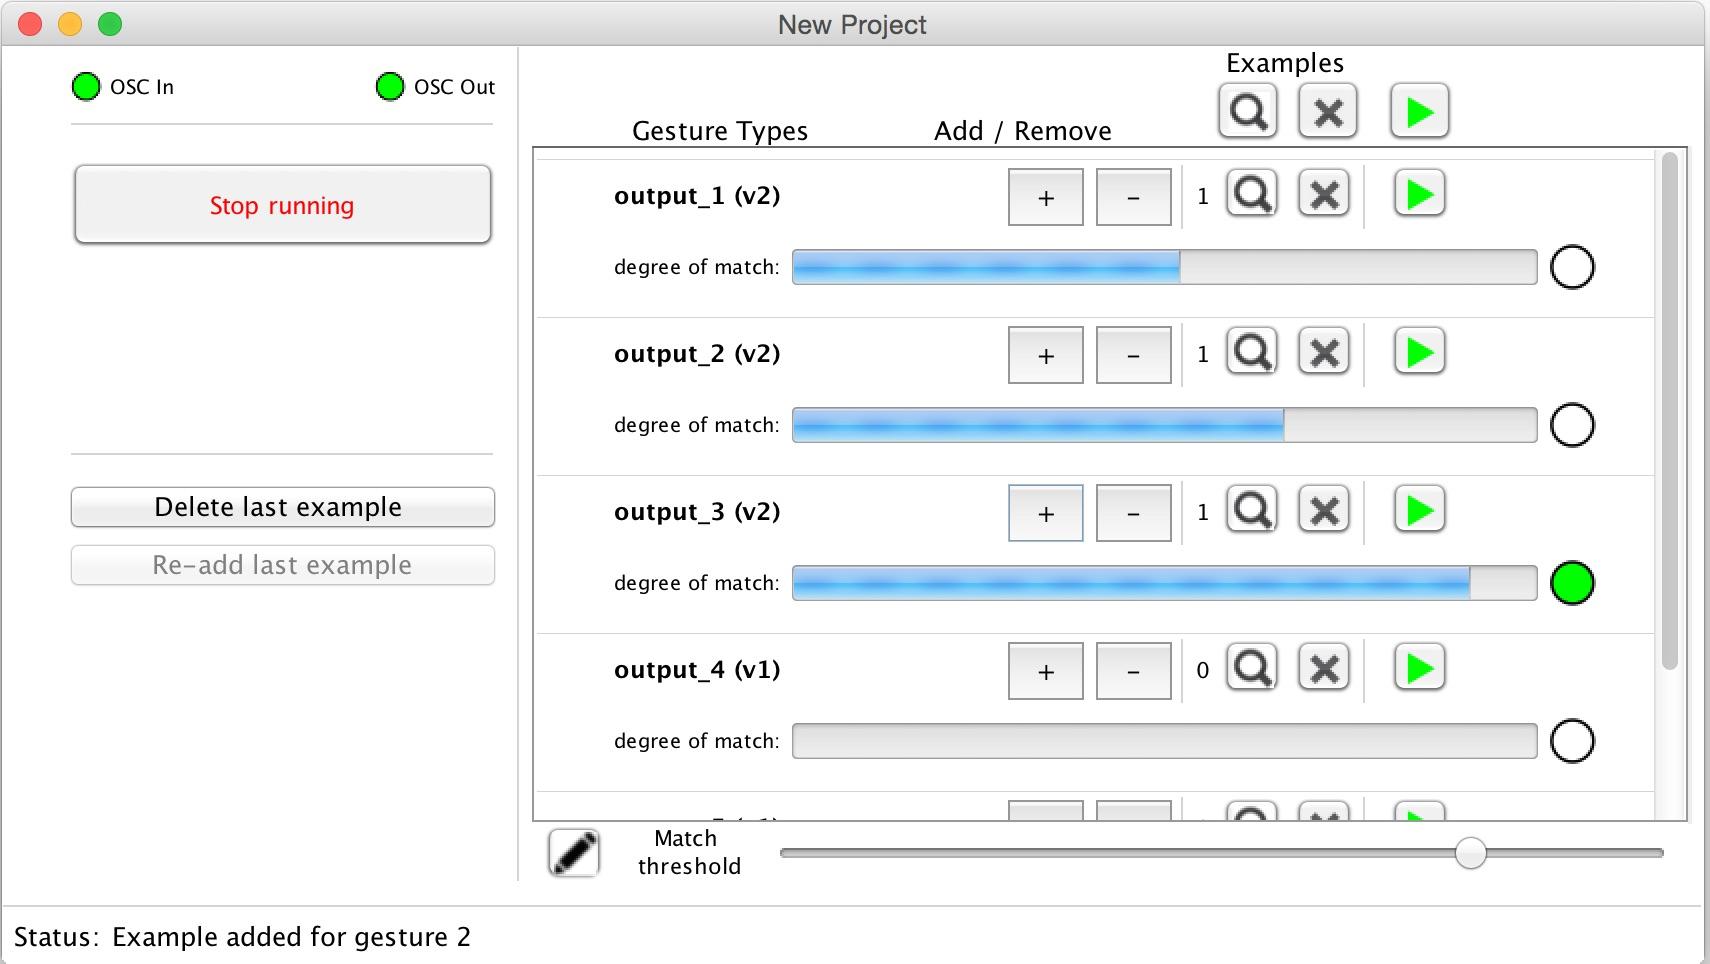 Screenshot_v2.1.0.1